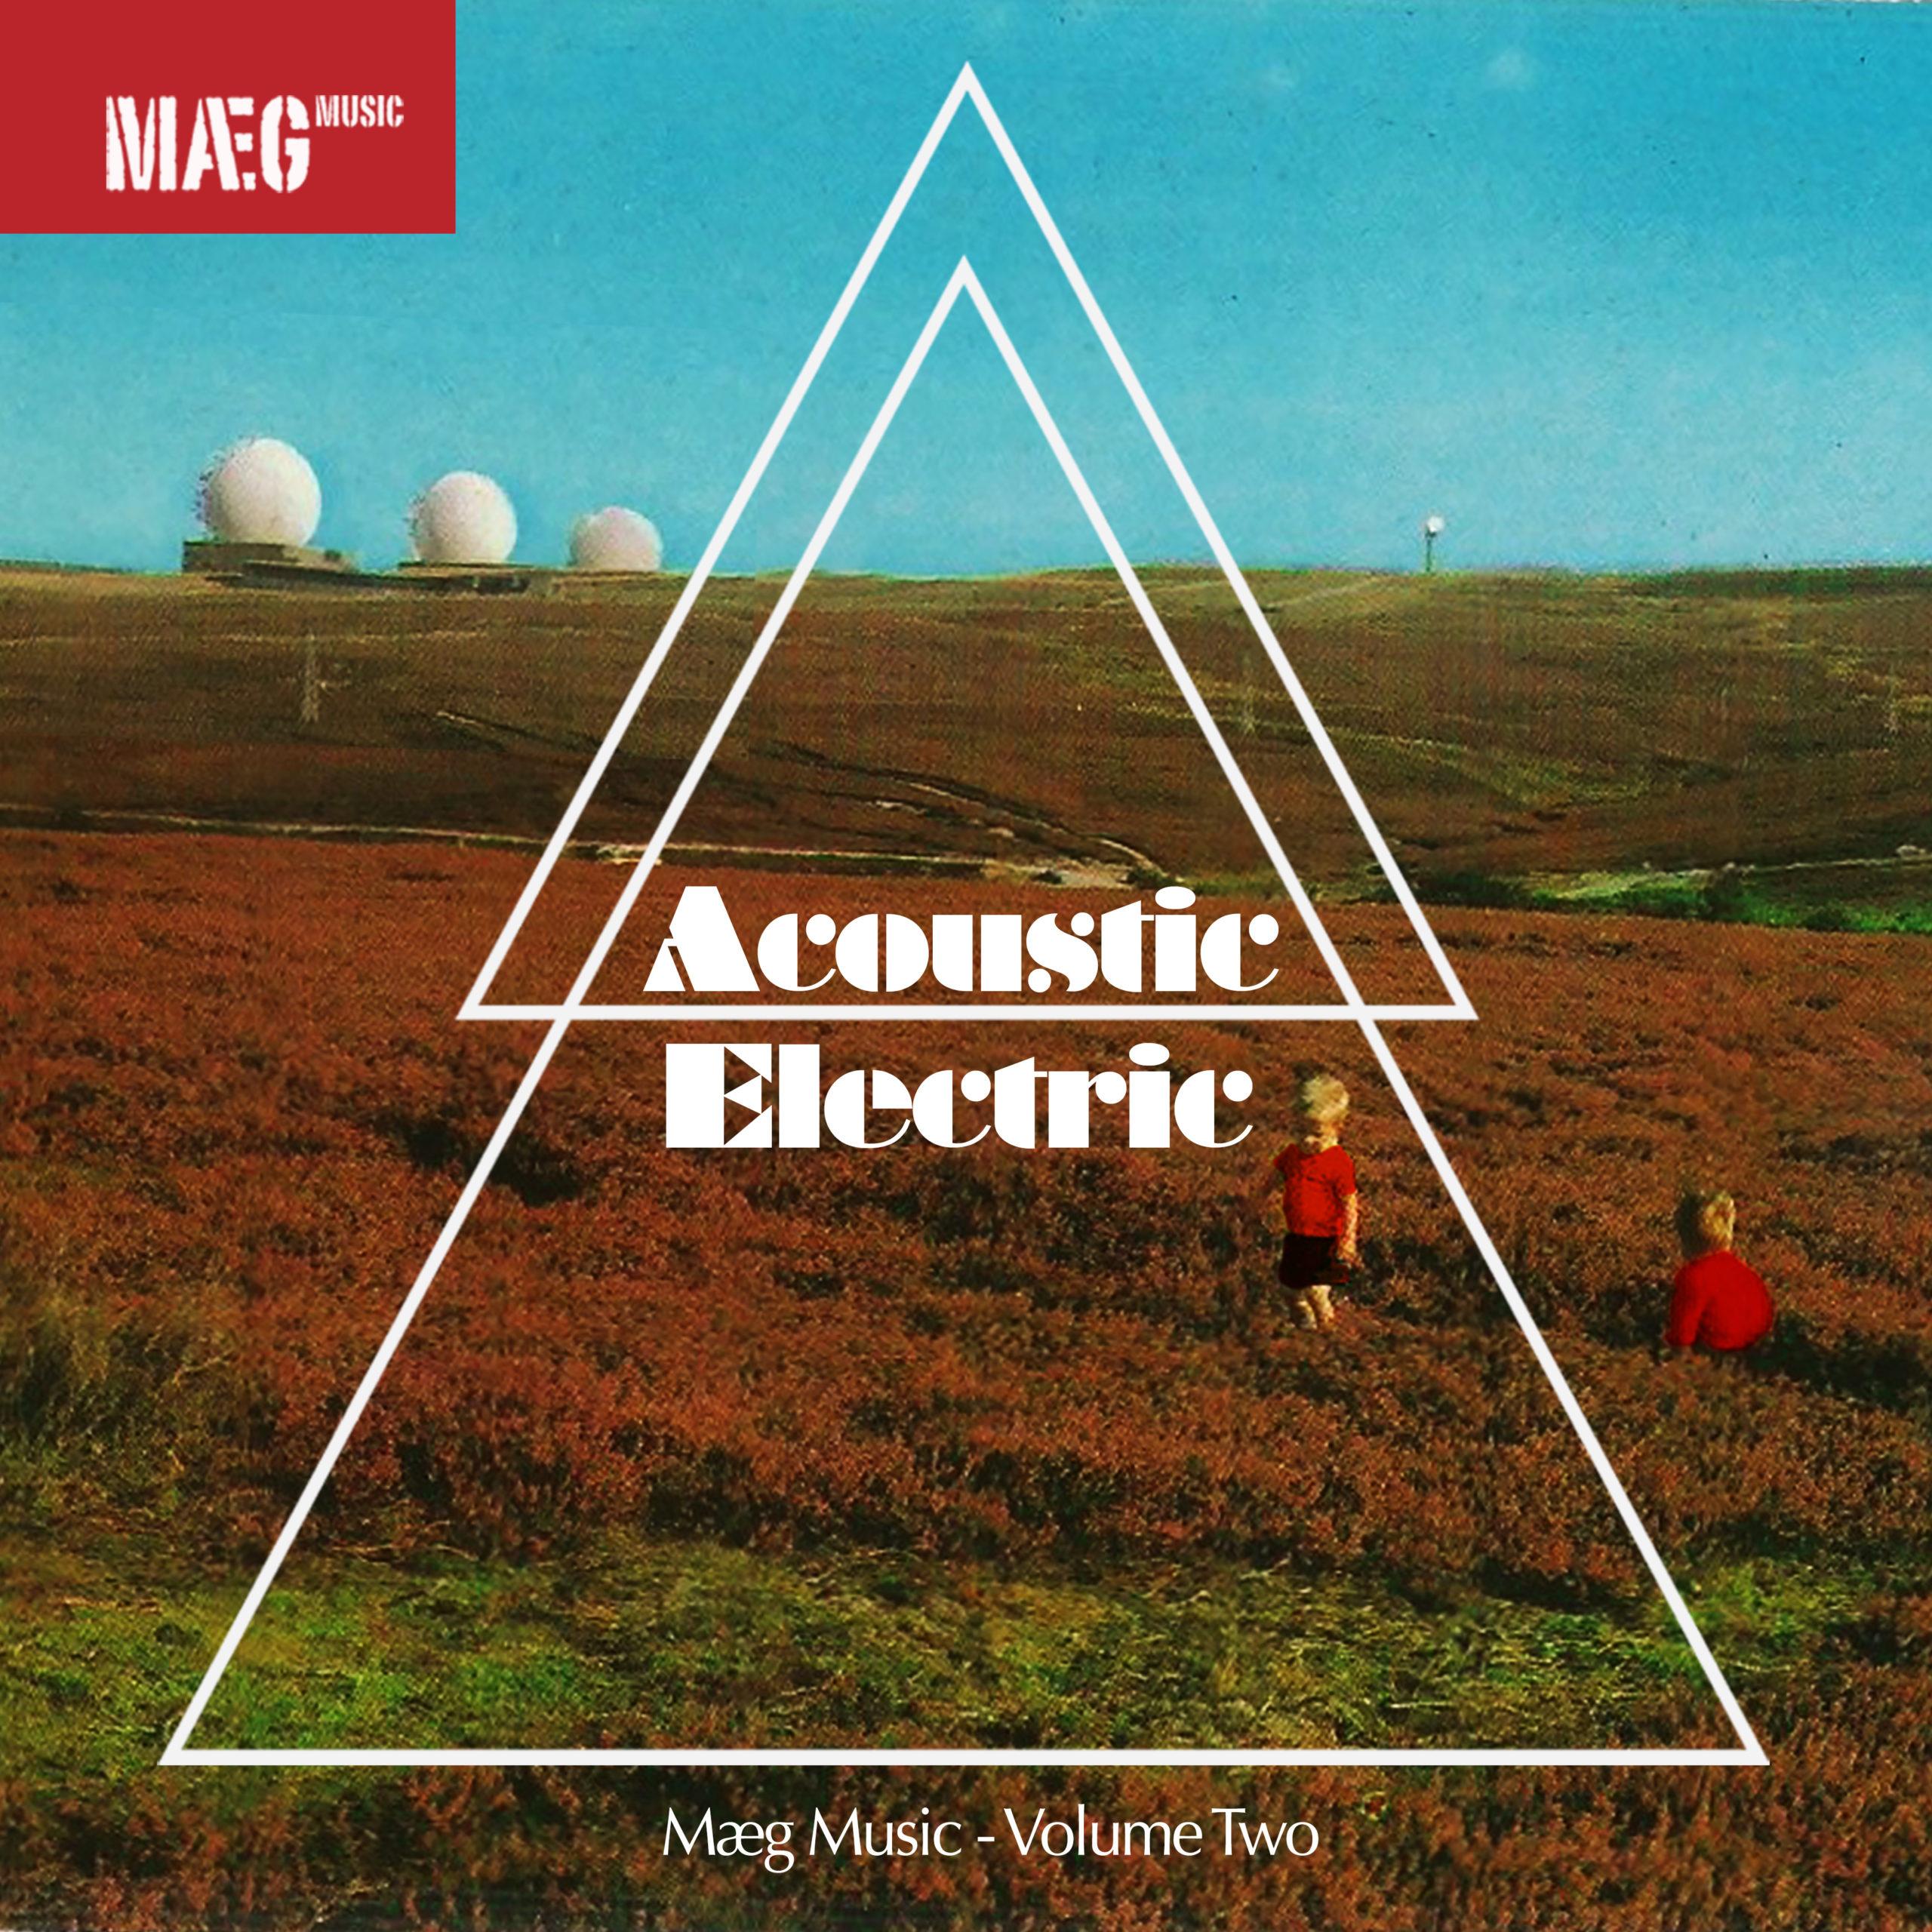 2020 Vision: Maeg Music compilation